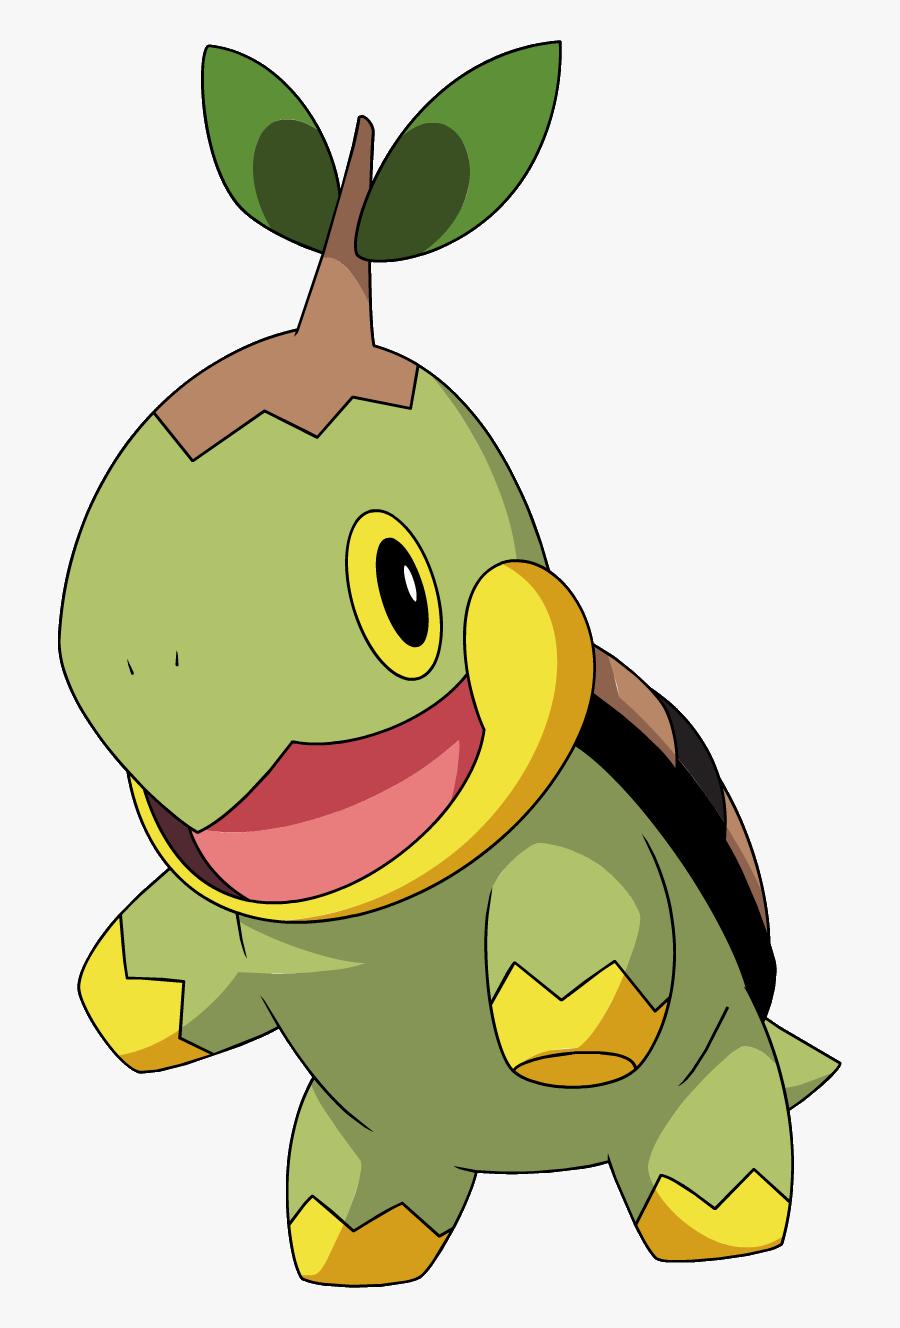 Pokemon Turtwig Png, Transparent Clipart